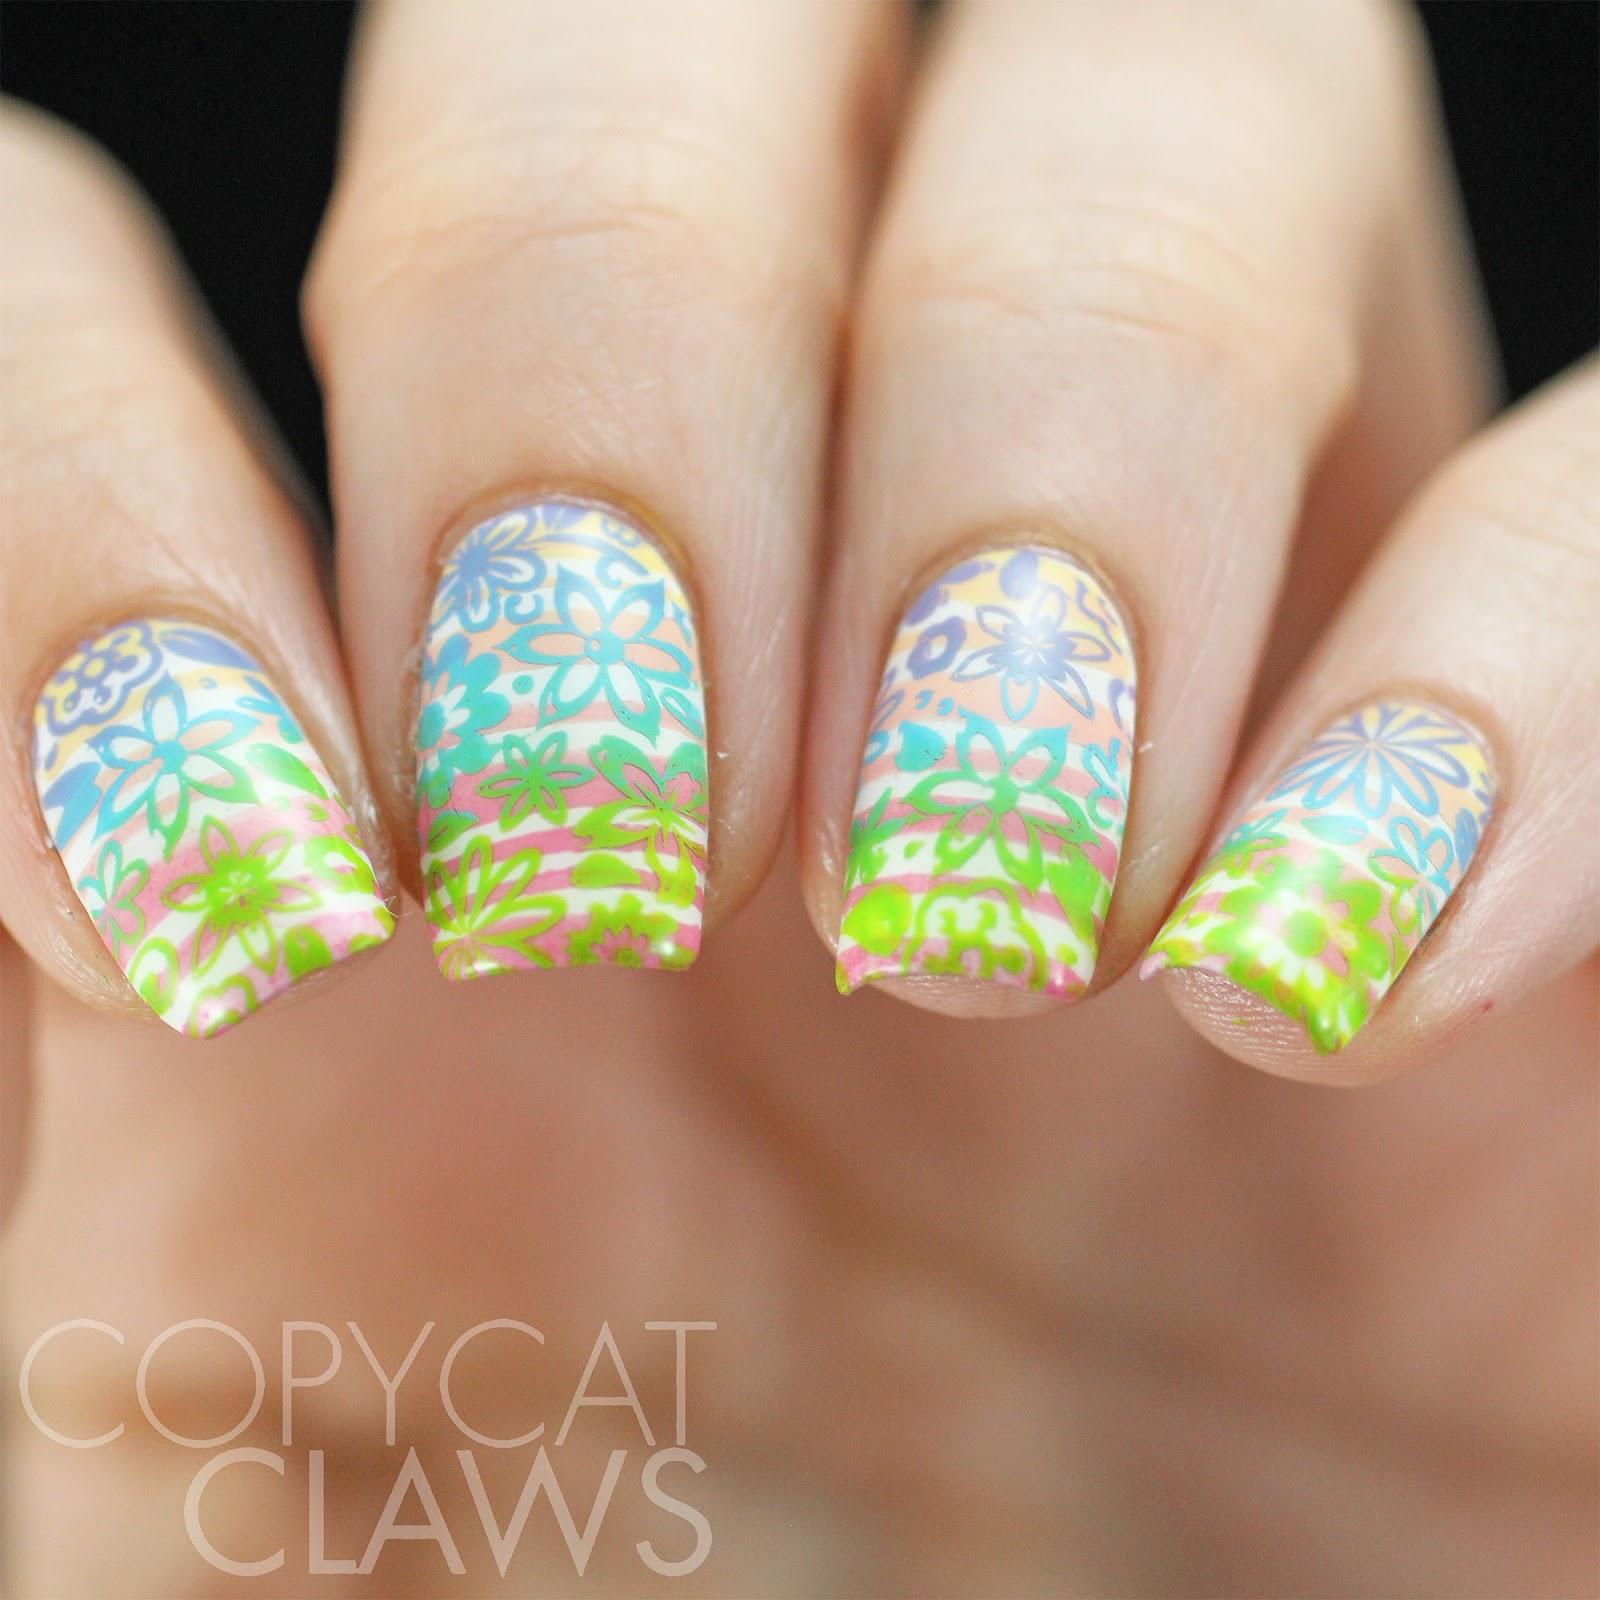 Copycat Claws: 40 Great Nail Art Ideas - Pastel